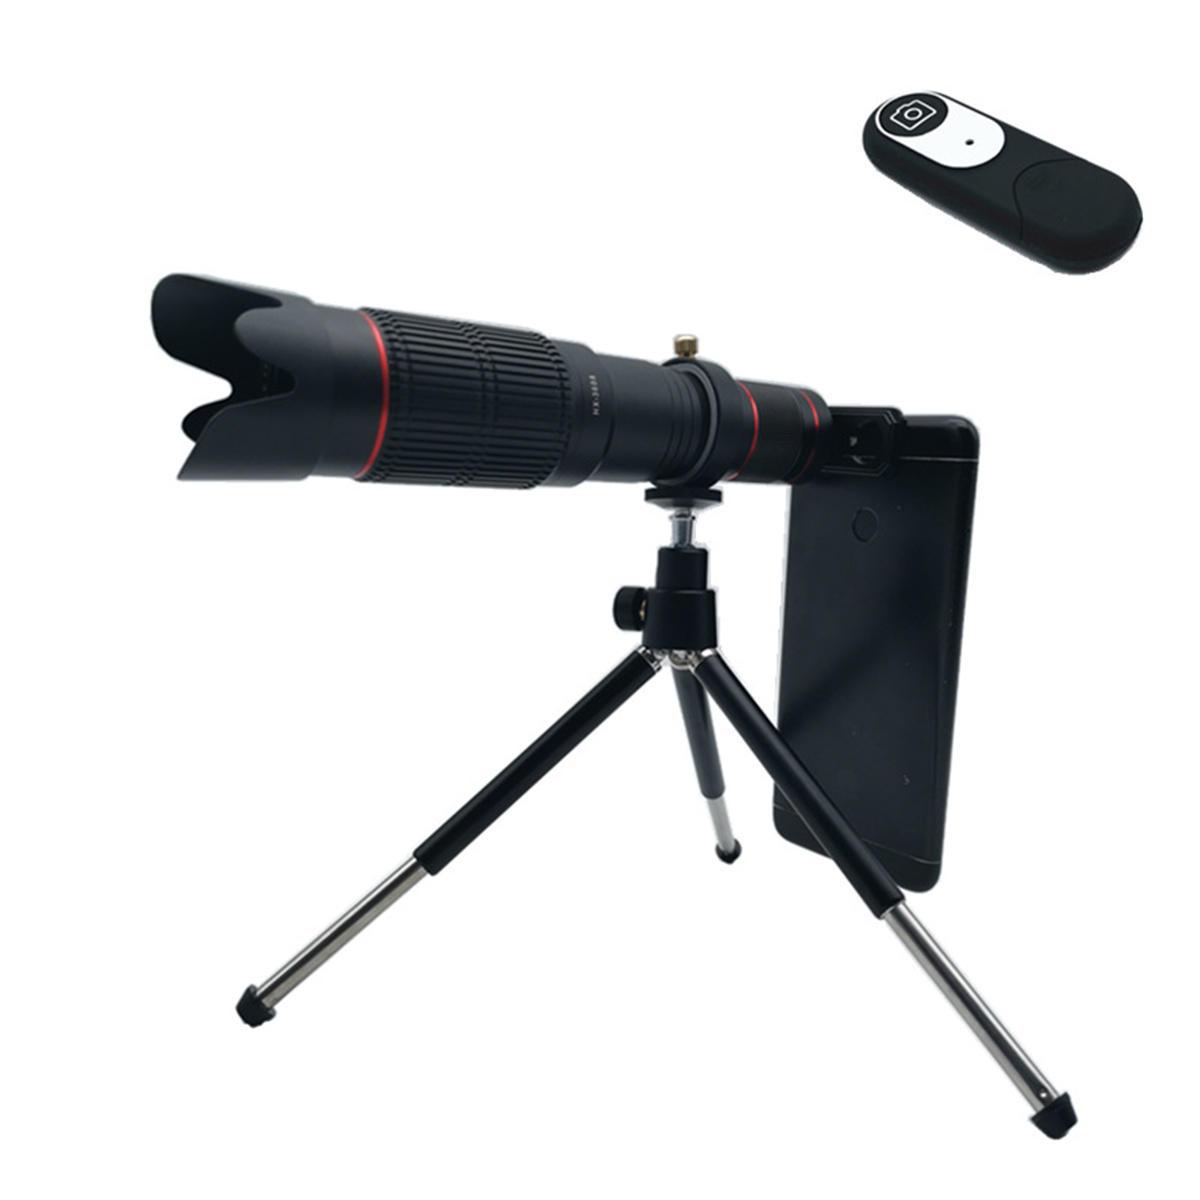 Moge 3.5-7x21 640X480 720P Infrared Video Record Night vision Binoculars - 2